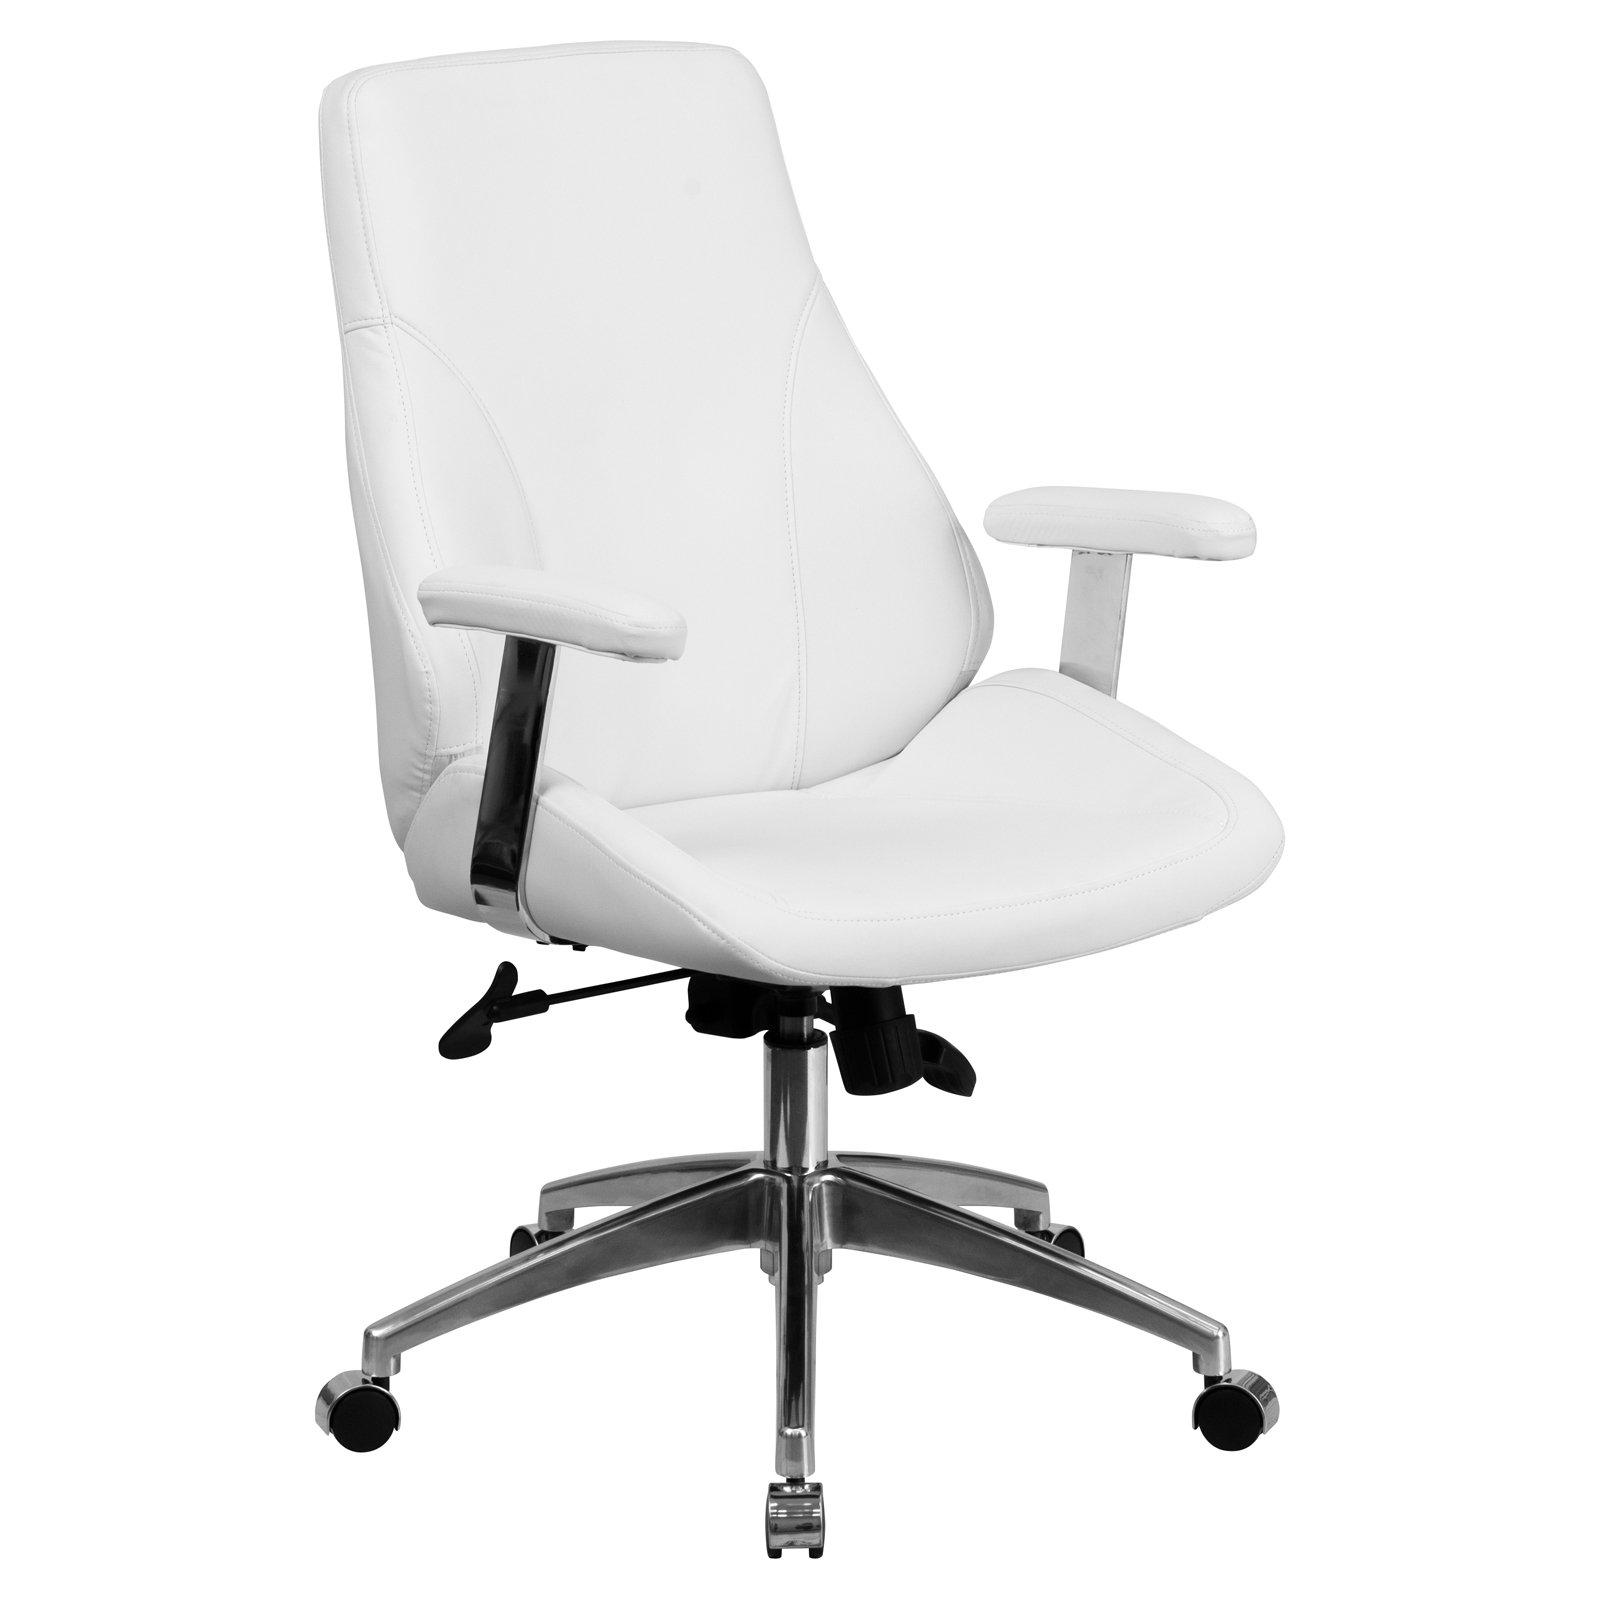 Flash Furniture Mid Back Leather Executive Swivel Office Chair White Swivel Office Chair Best Office Chair Contemporary Office Chairs